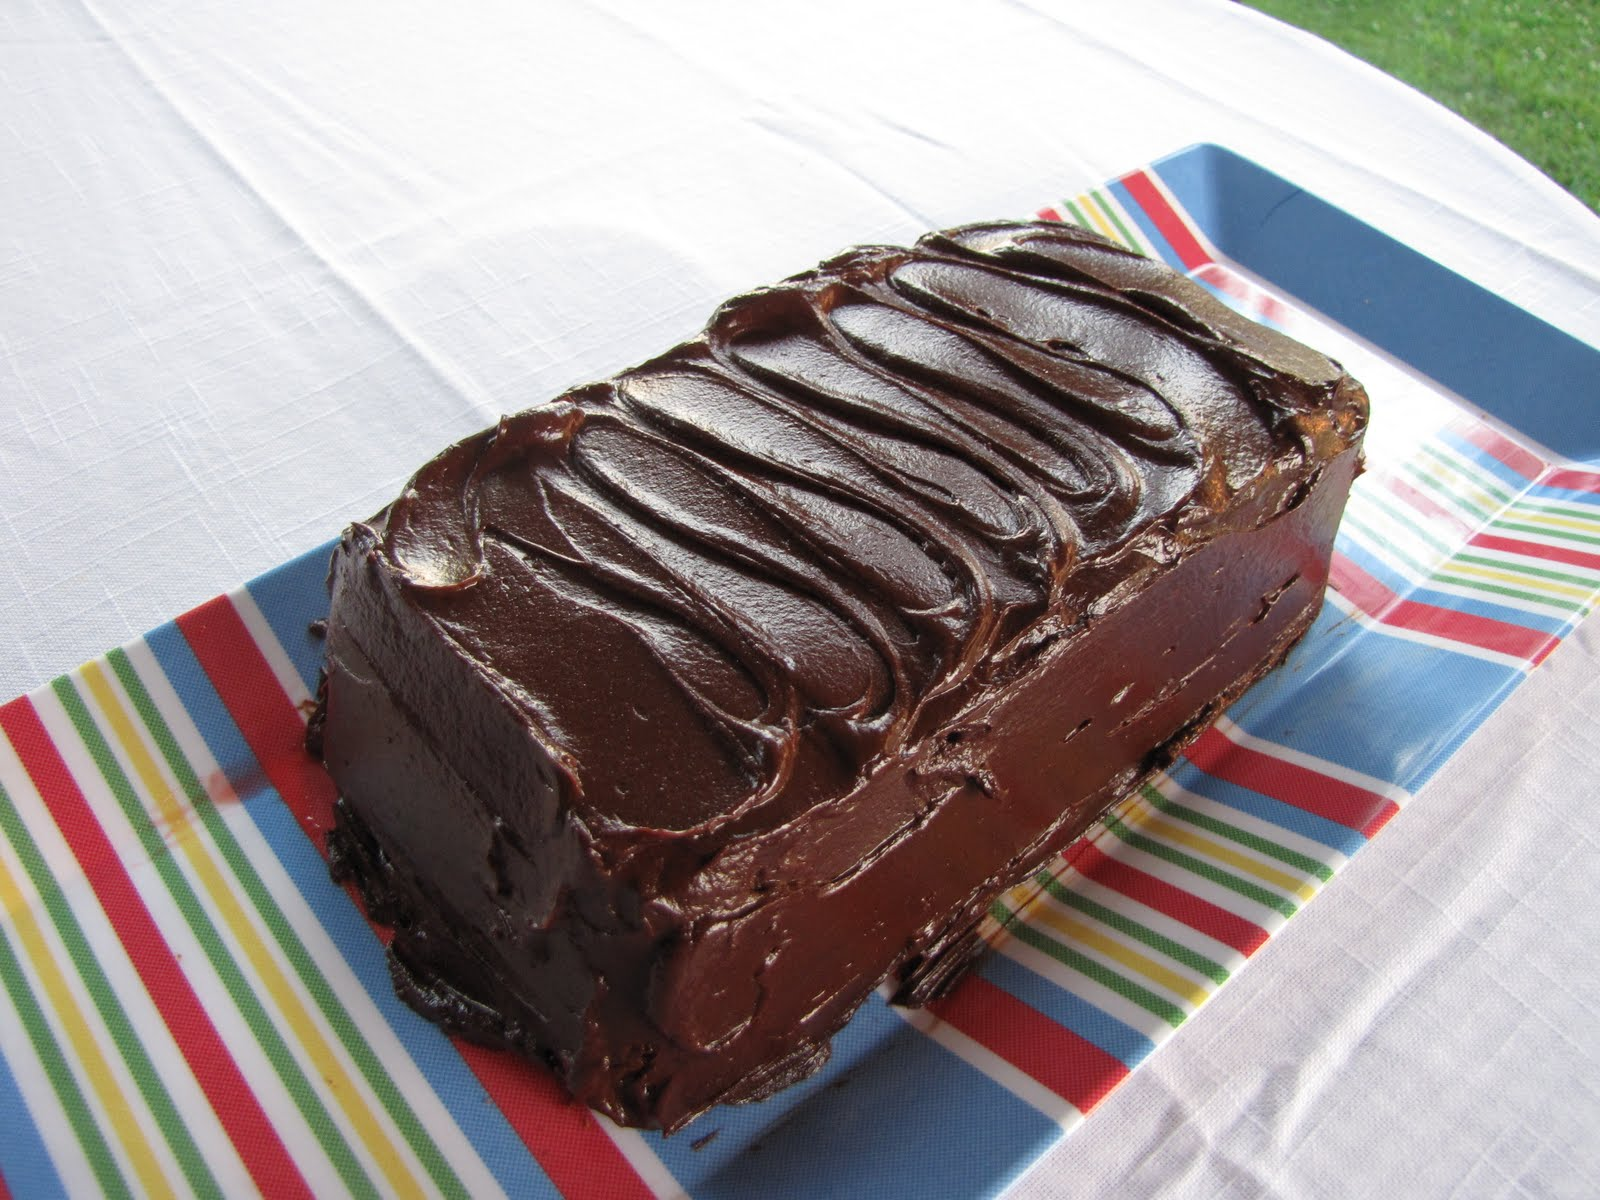 Dressy Cakes